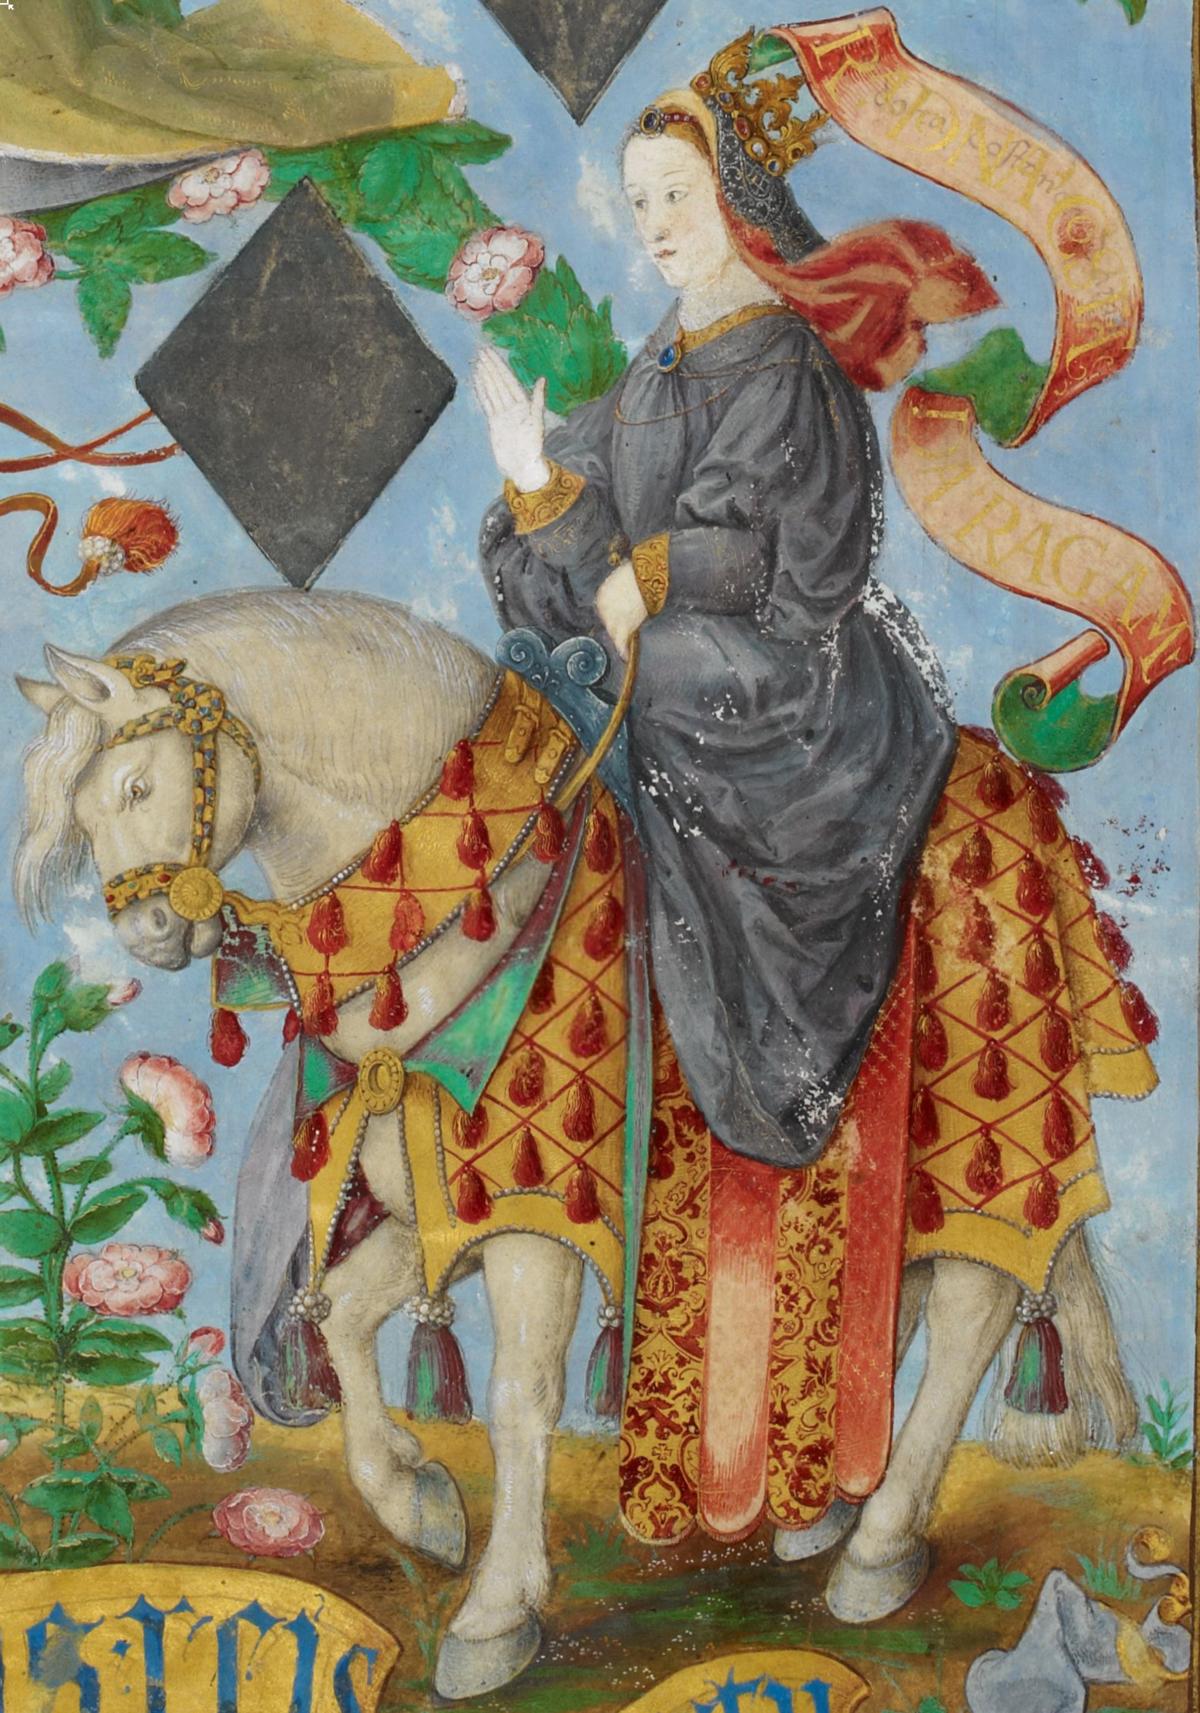 Constan Hohenstaufen Rainha Arag The Portuguese Genealogy Dos Reis Portugal 29 Yolanda